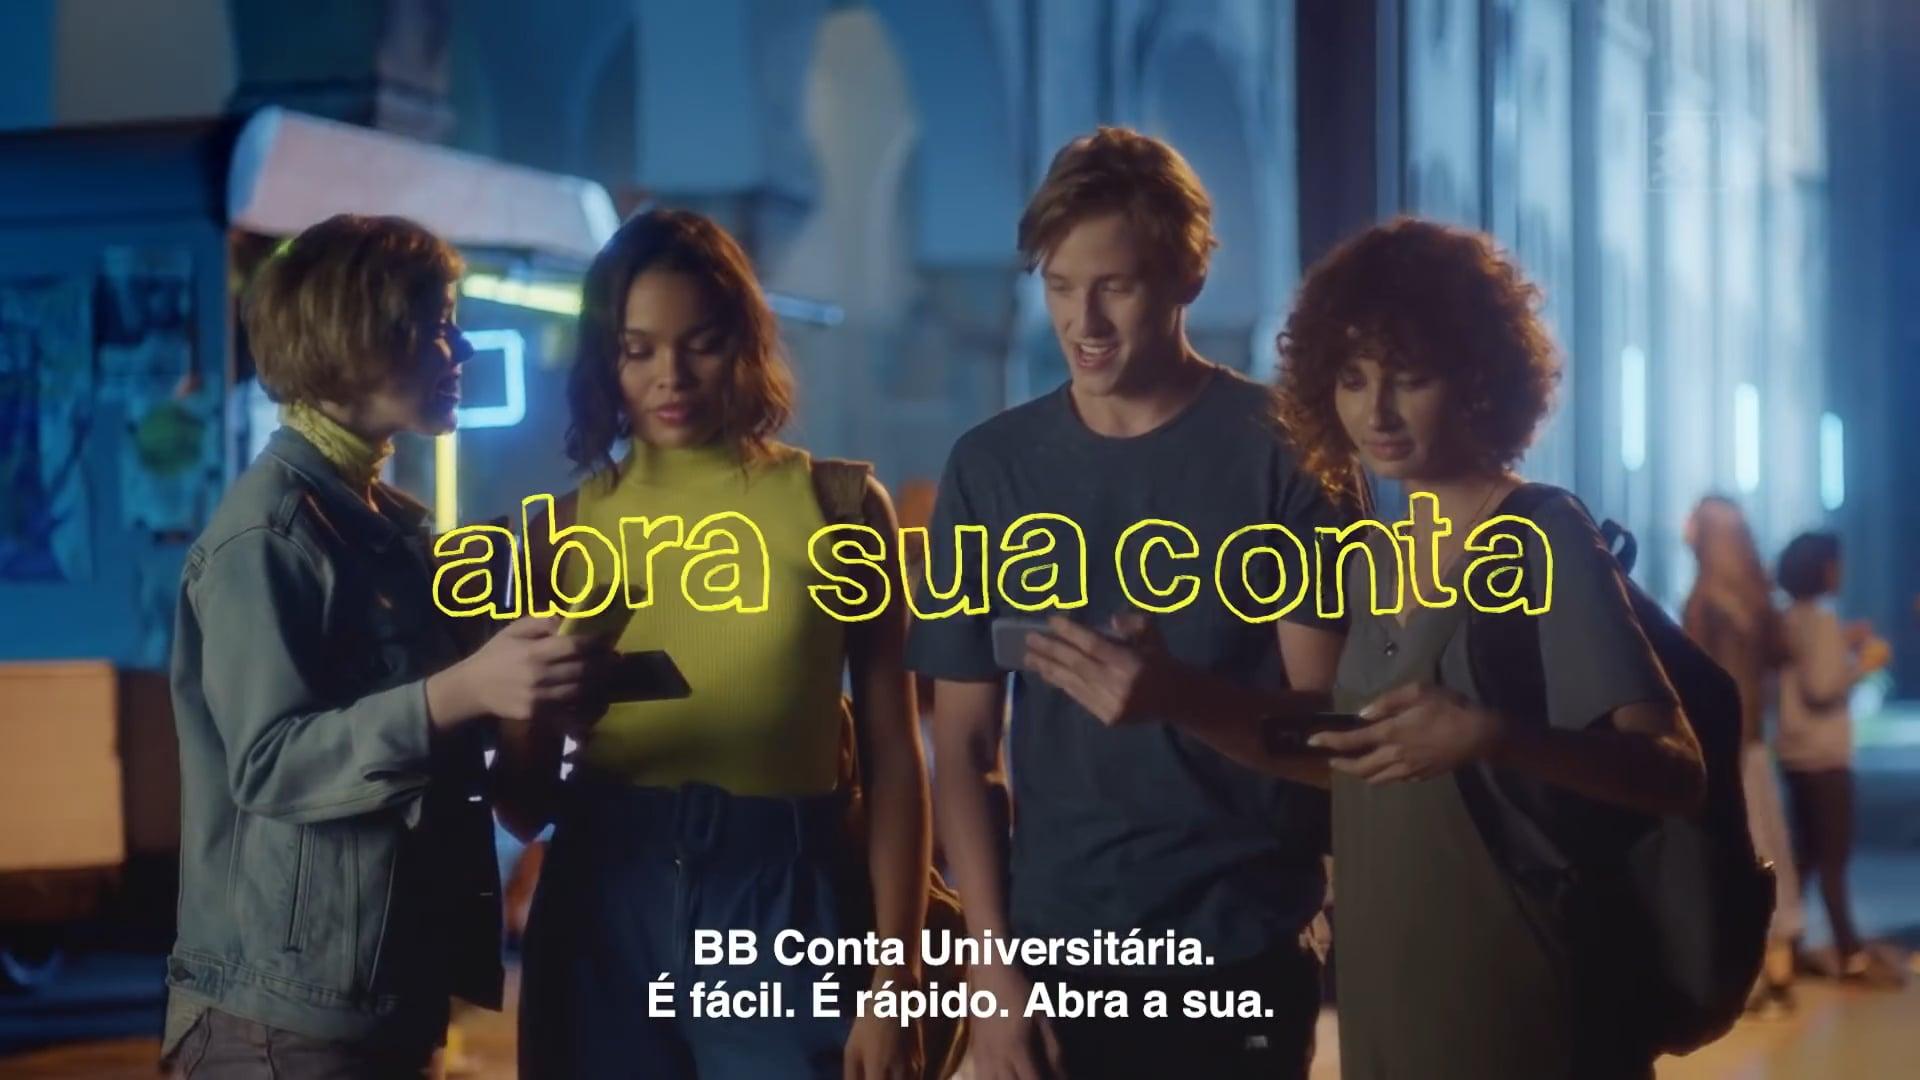 Banco do Brasil - Conta Universitária - Lew Lara